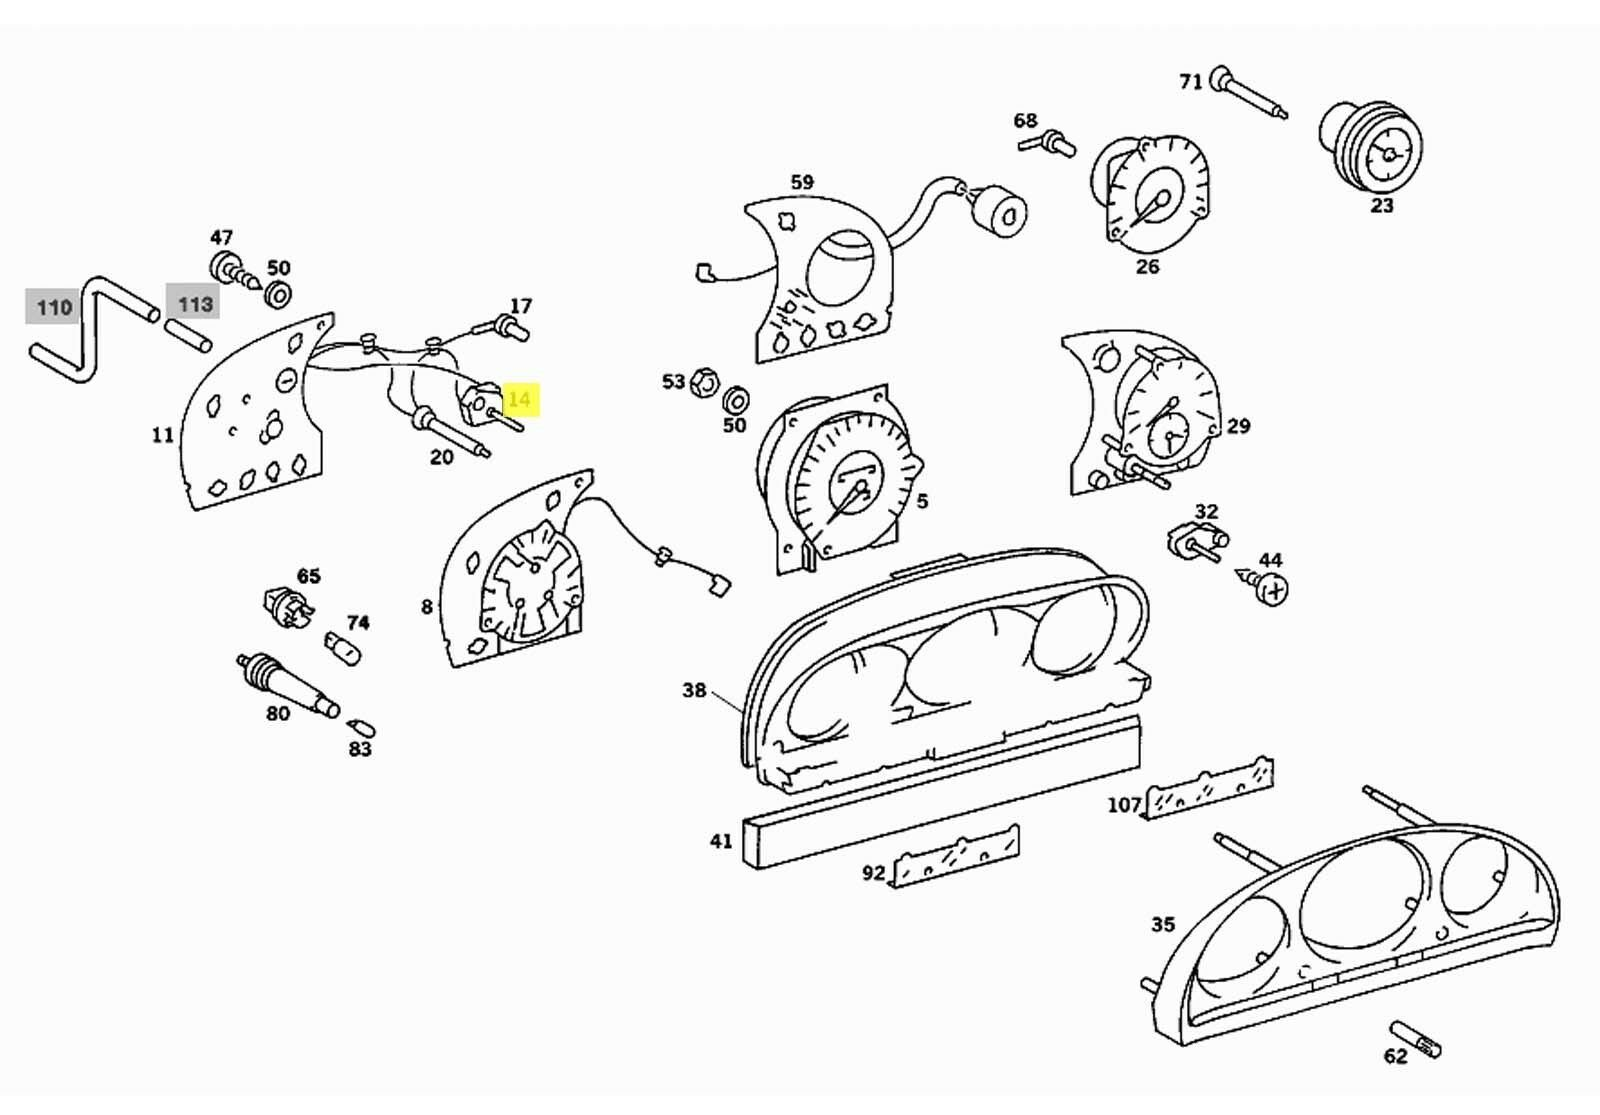 Mercedes Rheostat/Potentiometer for Instrument Panel